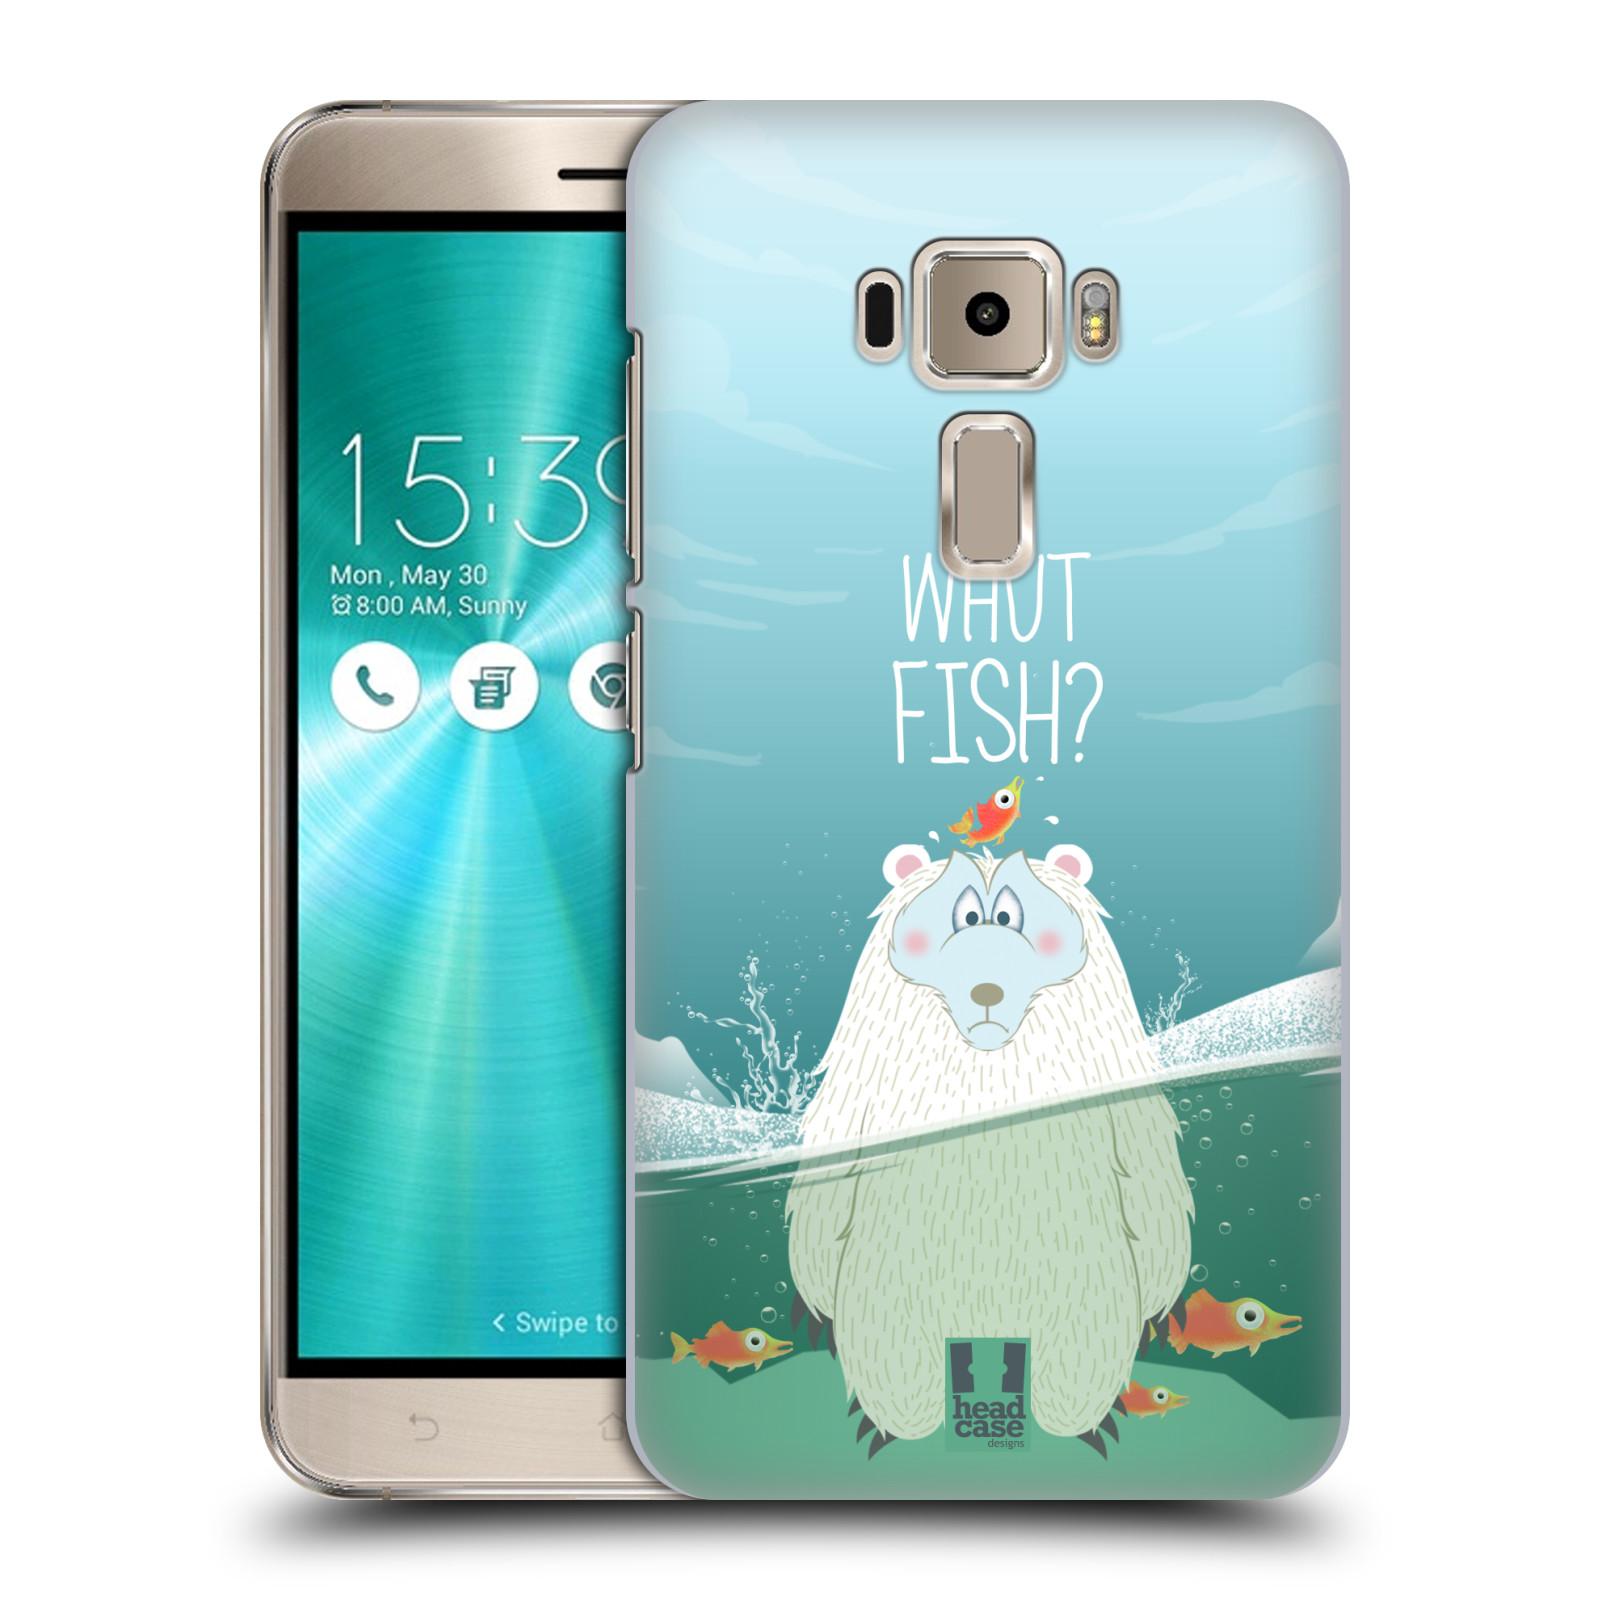 Plastové pouzdro na mobil Asus ZenFone 3 ZE520KL HEAD CASE Medvěd Whut Fish?